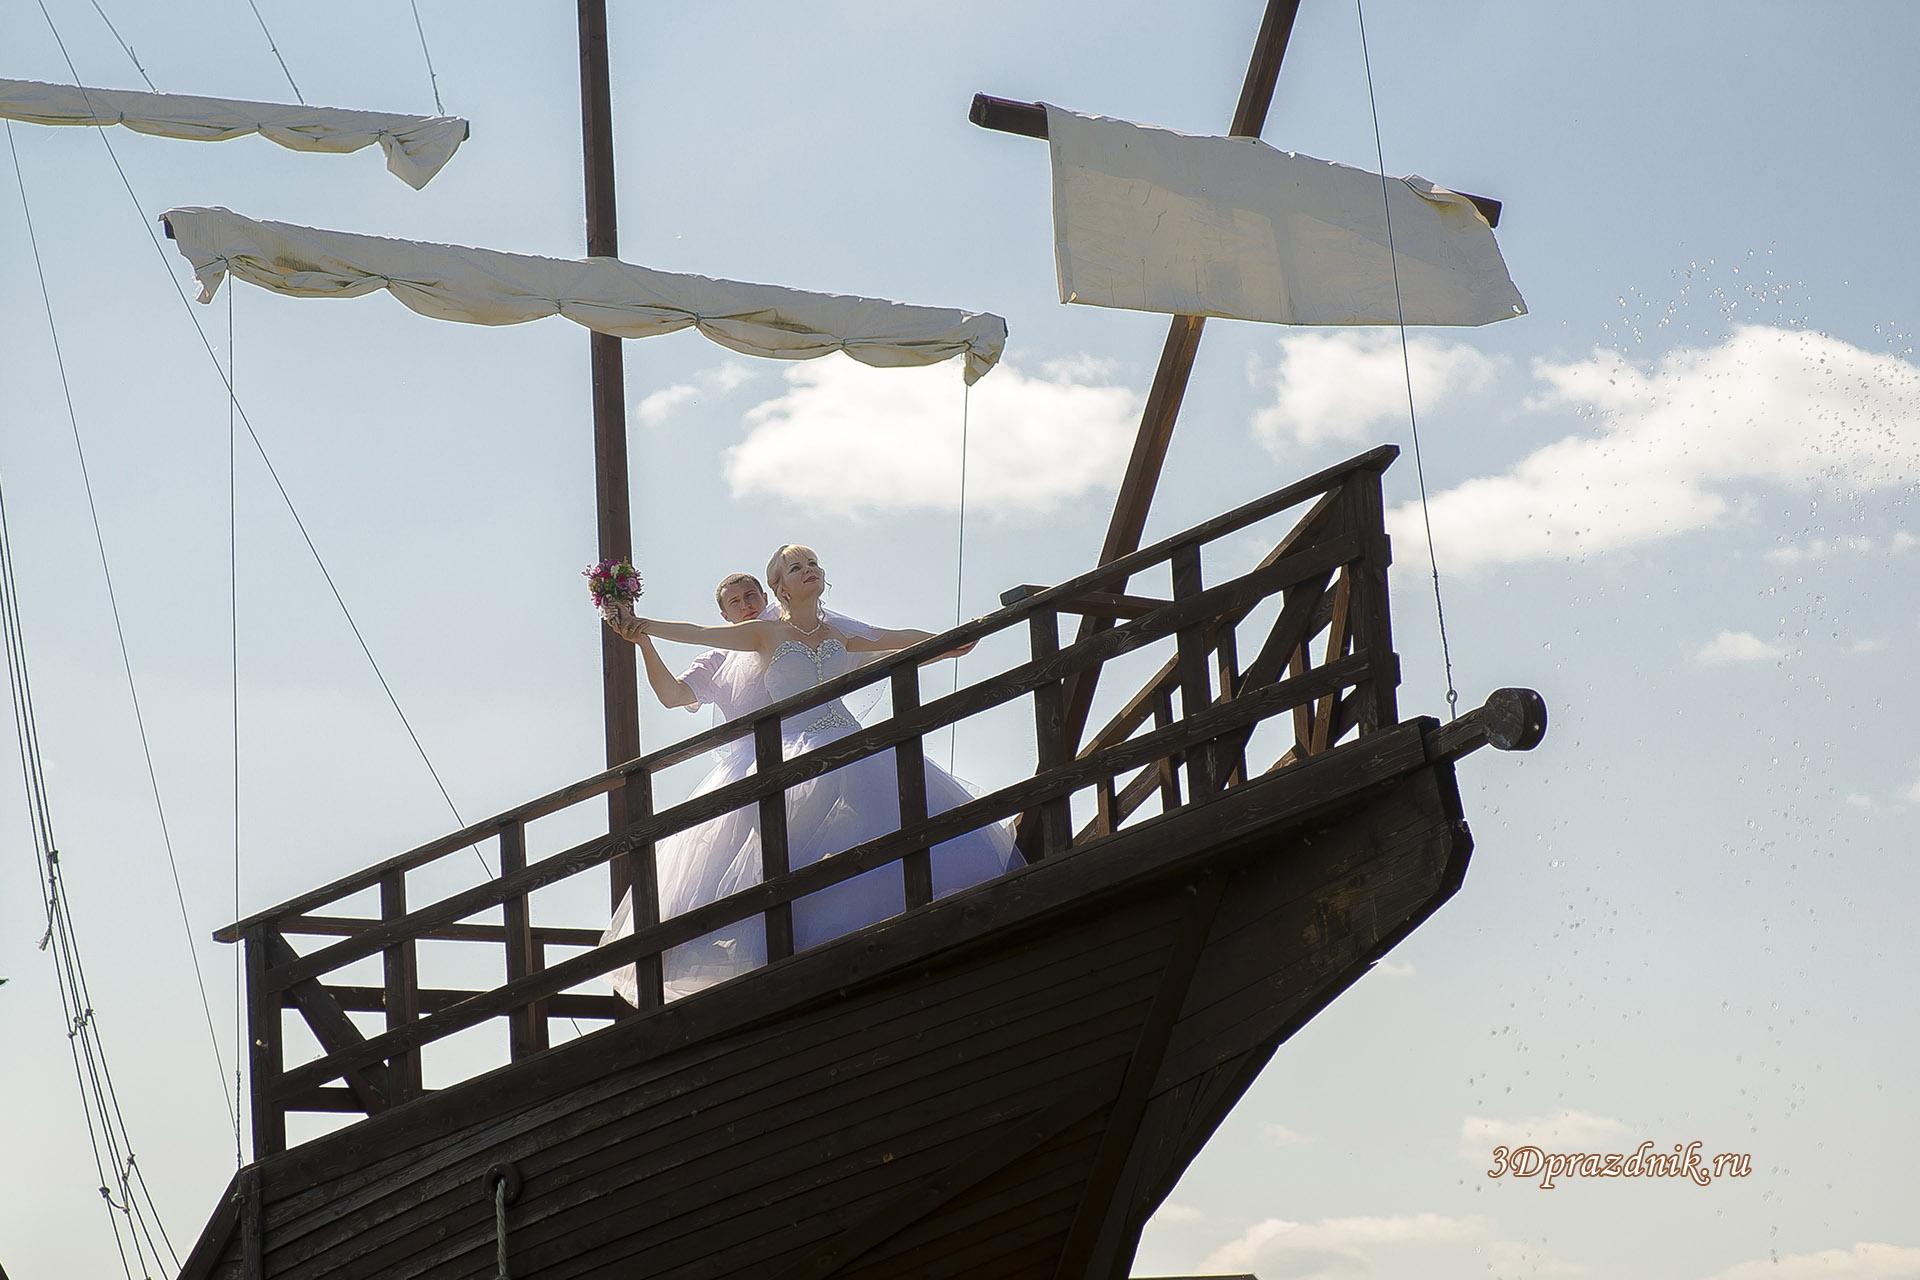 Свадебная прогулка. Корабль. Паруса.